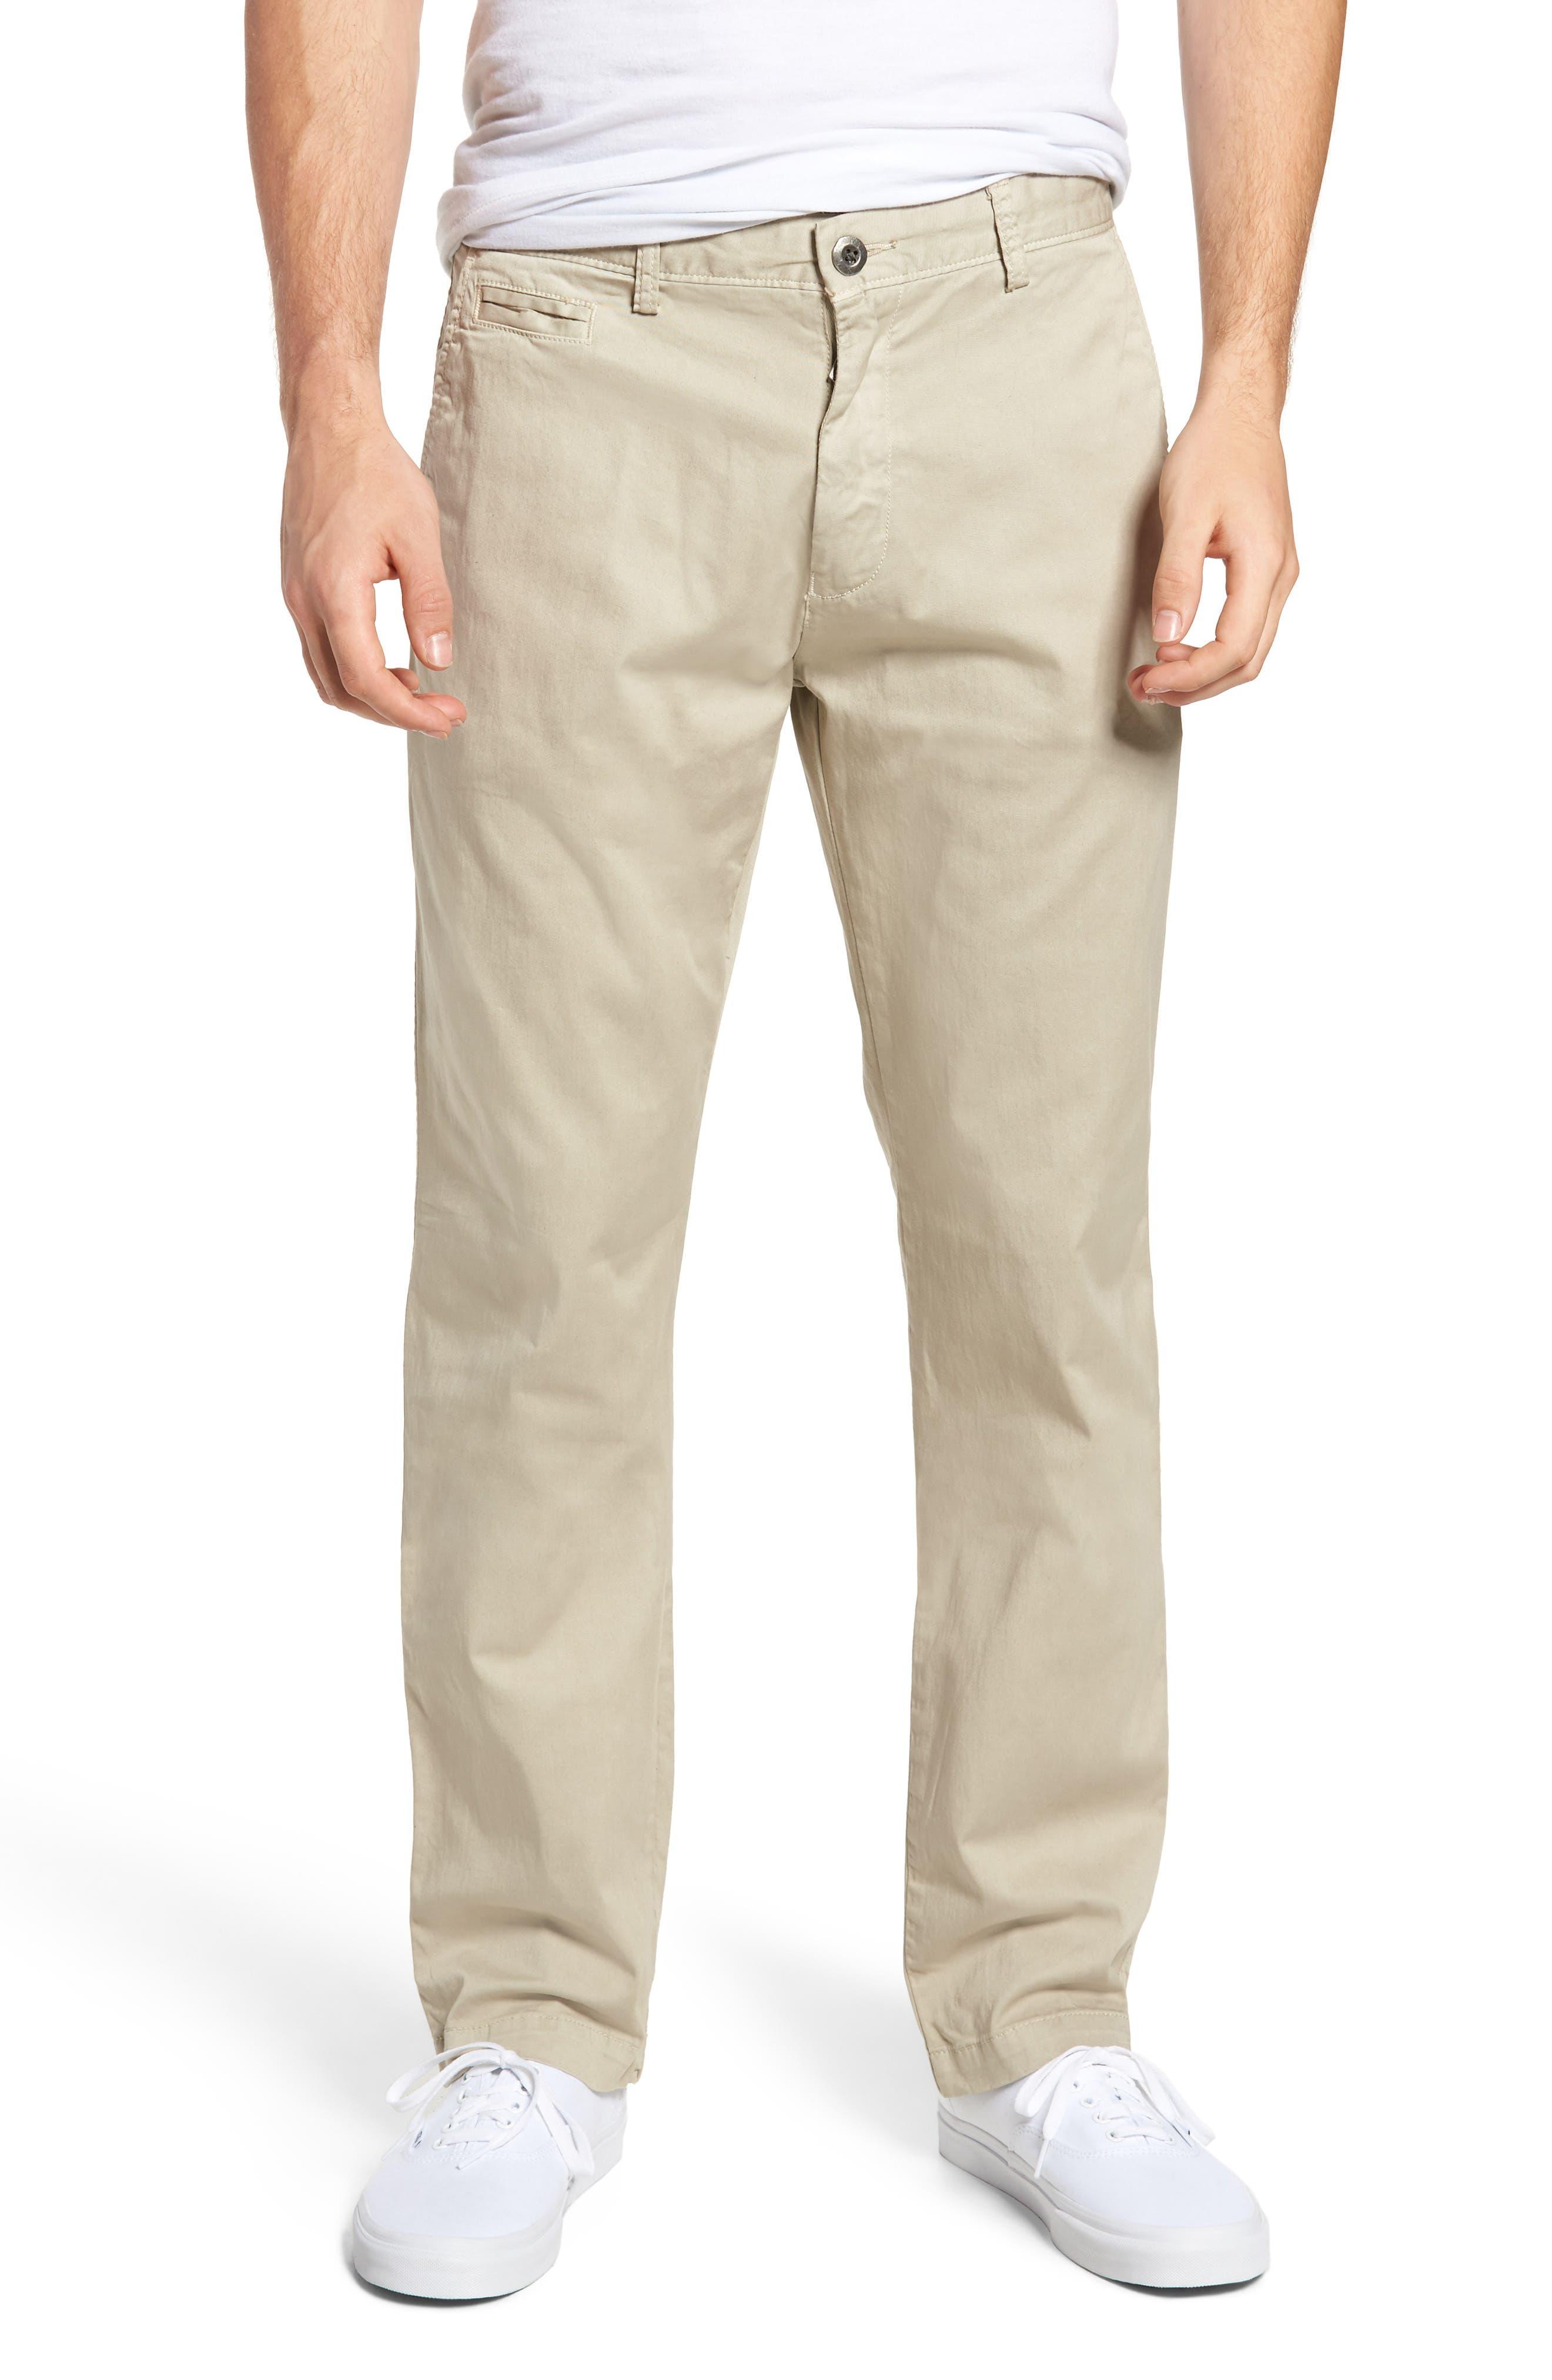 Belmont Stretch Chino Pants,                         Main,                         color, Bone